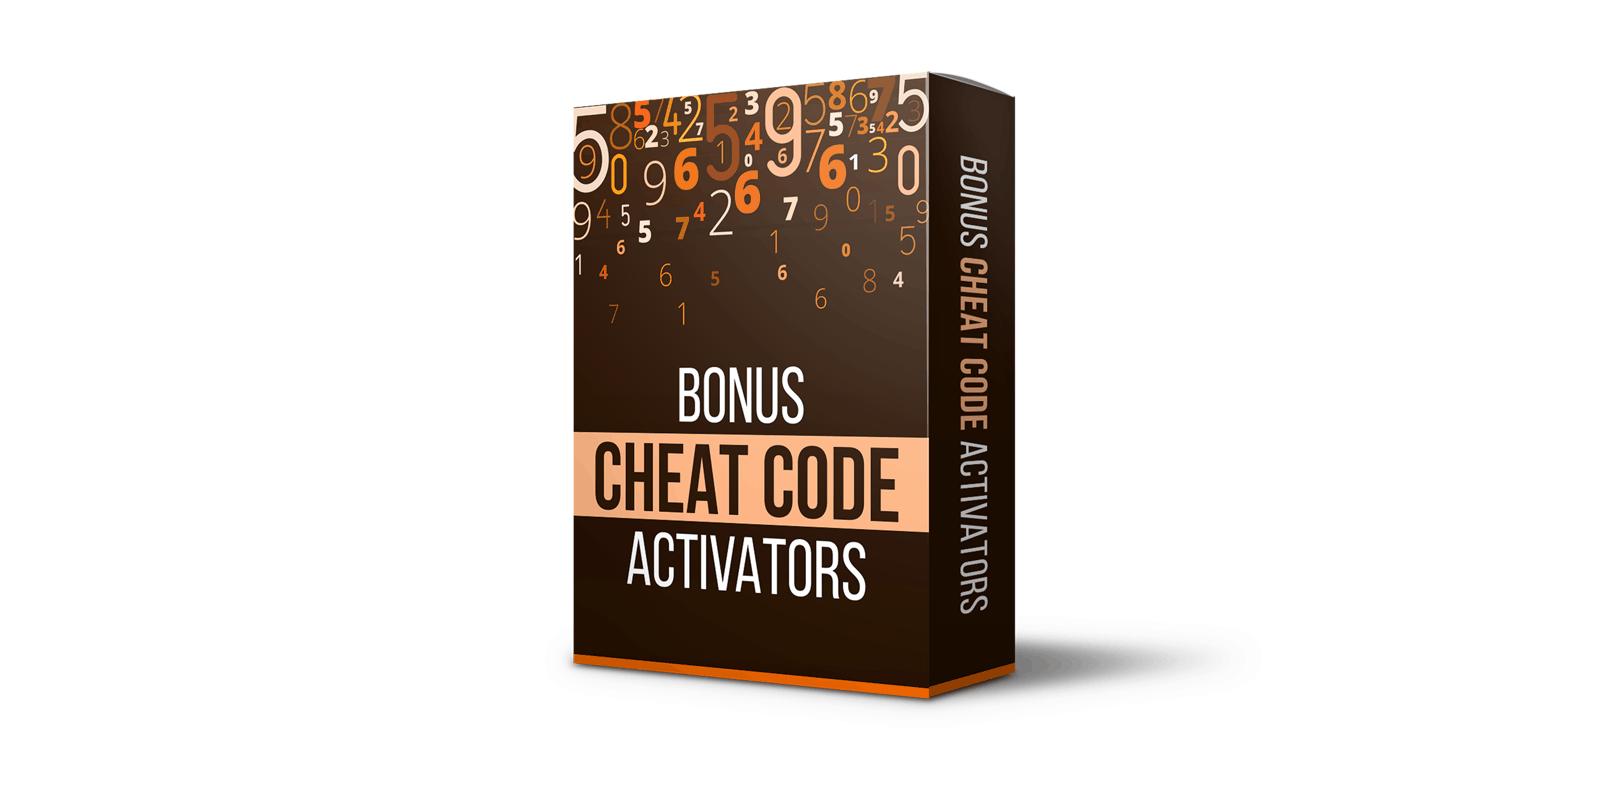 Cheat Code Activators bonus